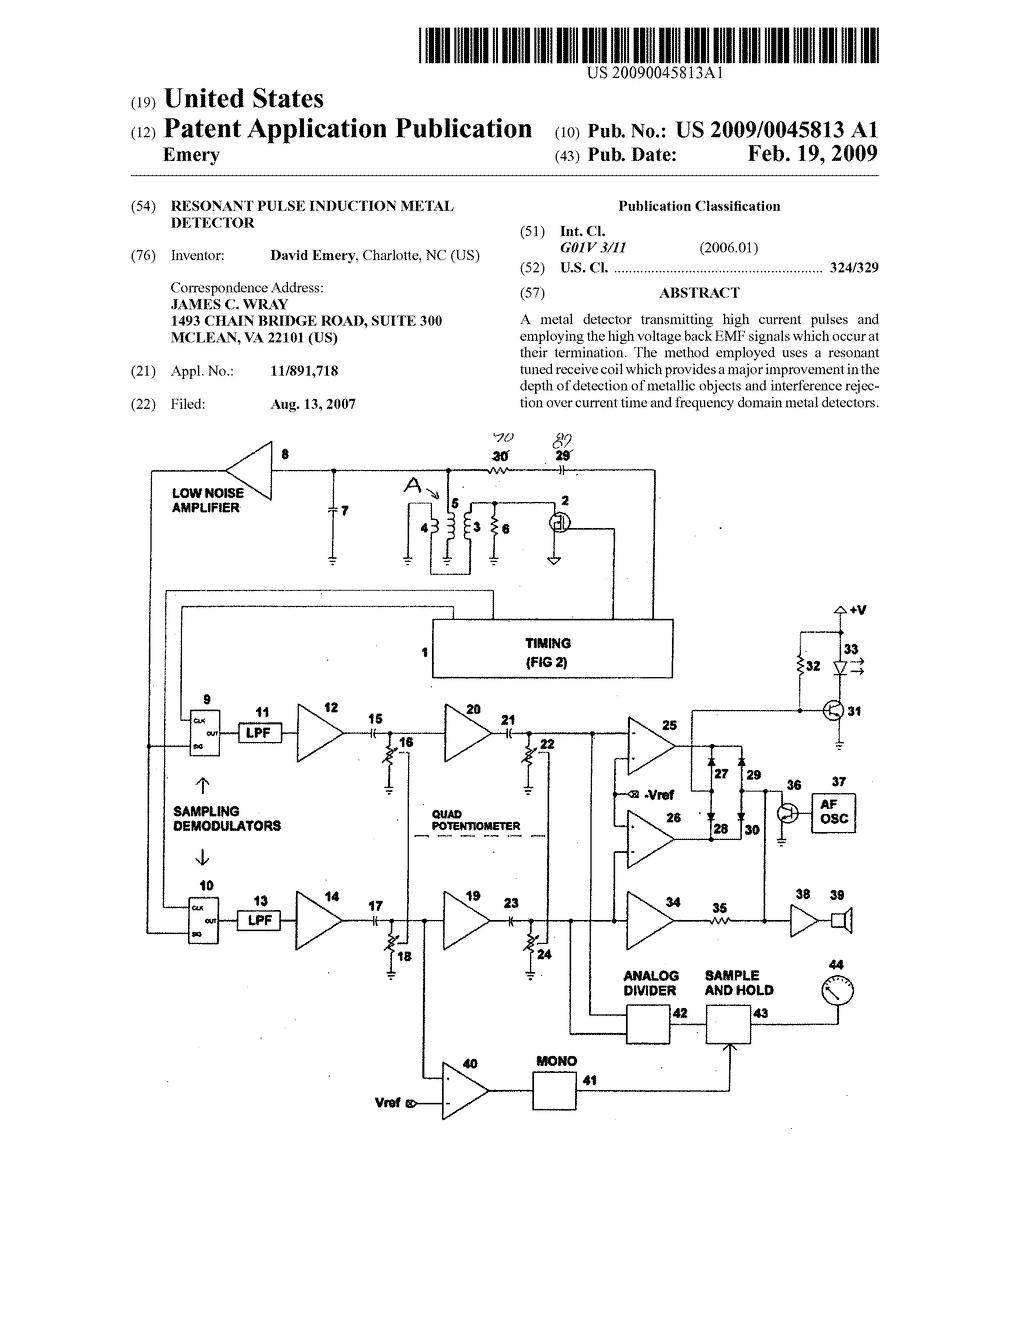 resonant pulse induction metal detector diagram schematic and rh patentsencyclopedia com pulse induction metal detector circuit diagram simple pulse induction metal detector circuit diagram